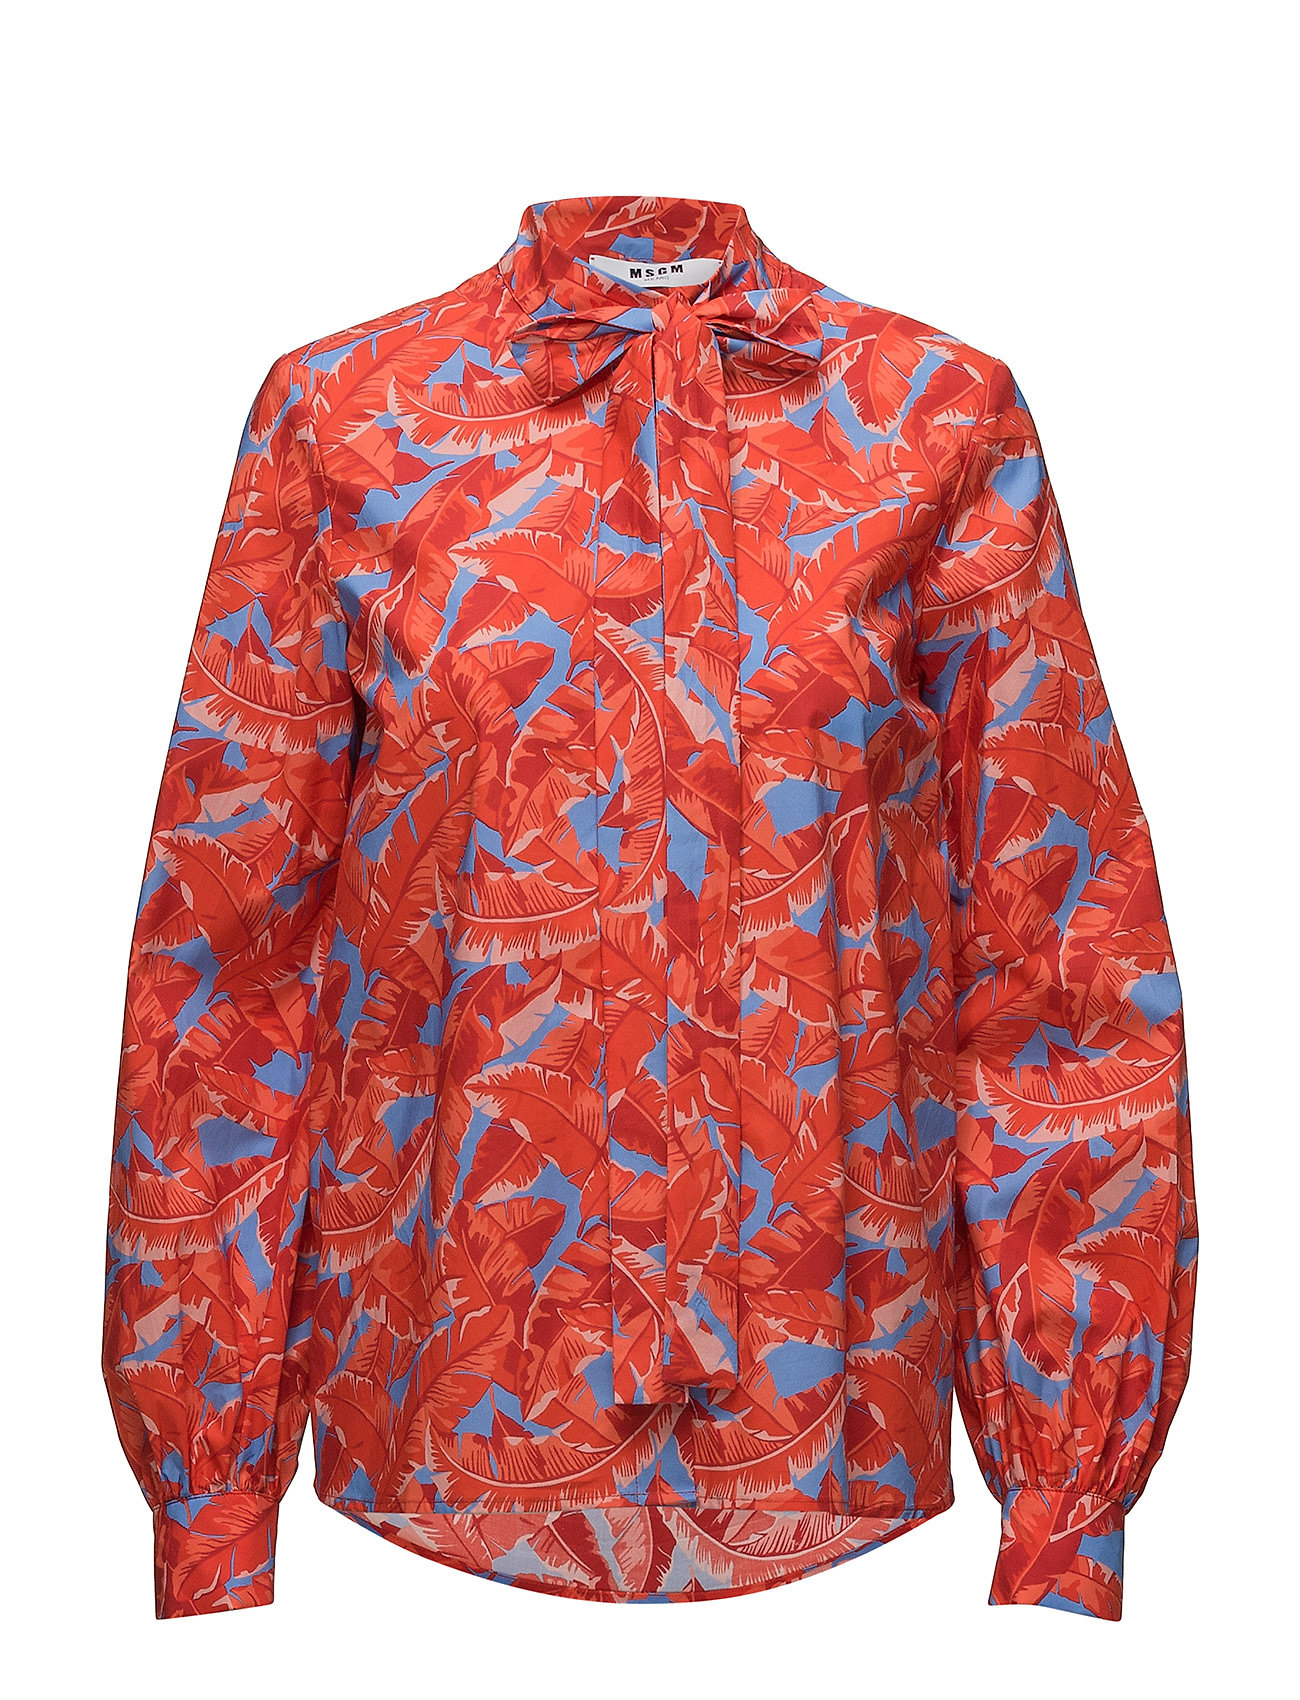 big sale 75615 22cd5 Shirt (Multi Coloured) (210 €) - MSGM -   Boozt.com